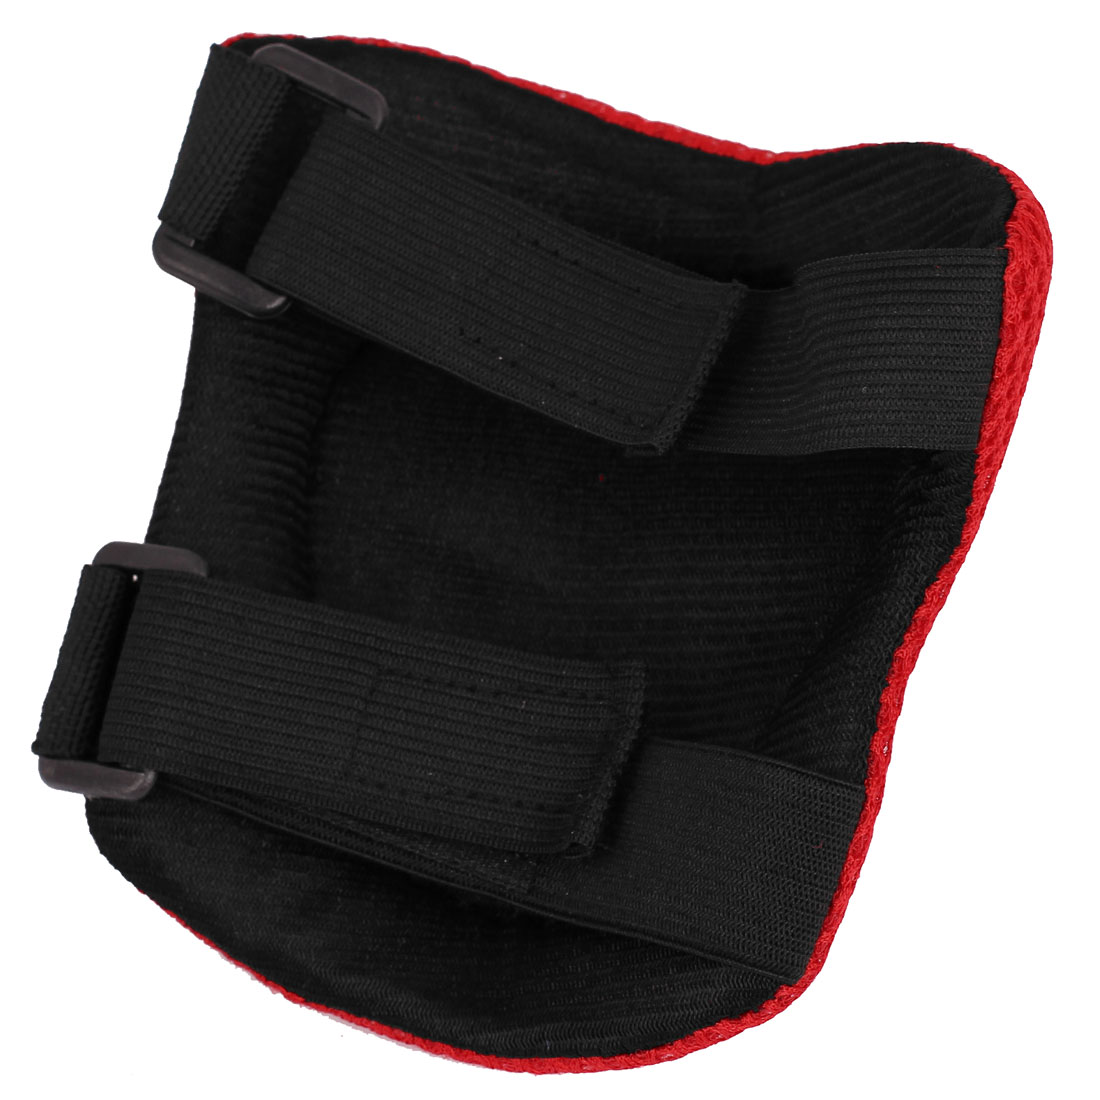 Skateboard Sponge Palm Elbow Knee Support Sports Protective Pads Red Black 6 Pcs - image 1 de 2